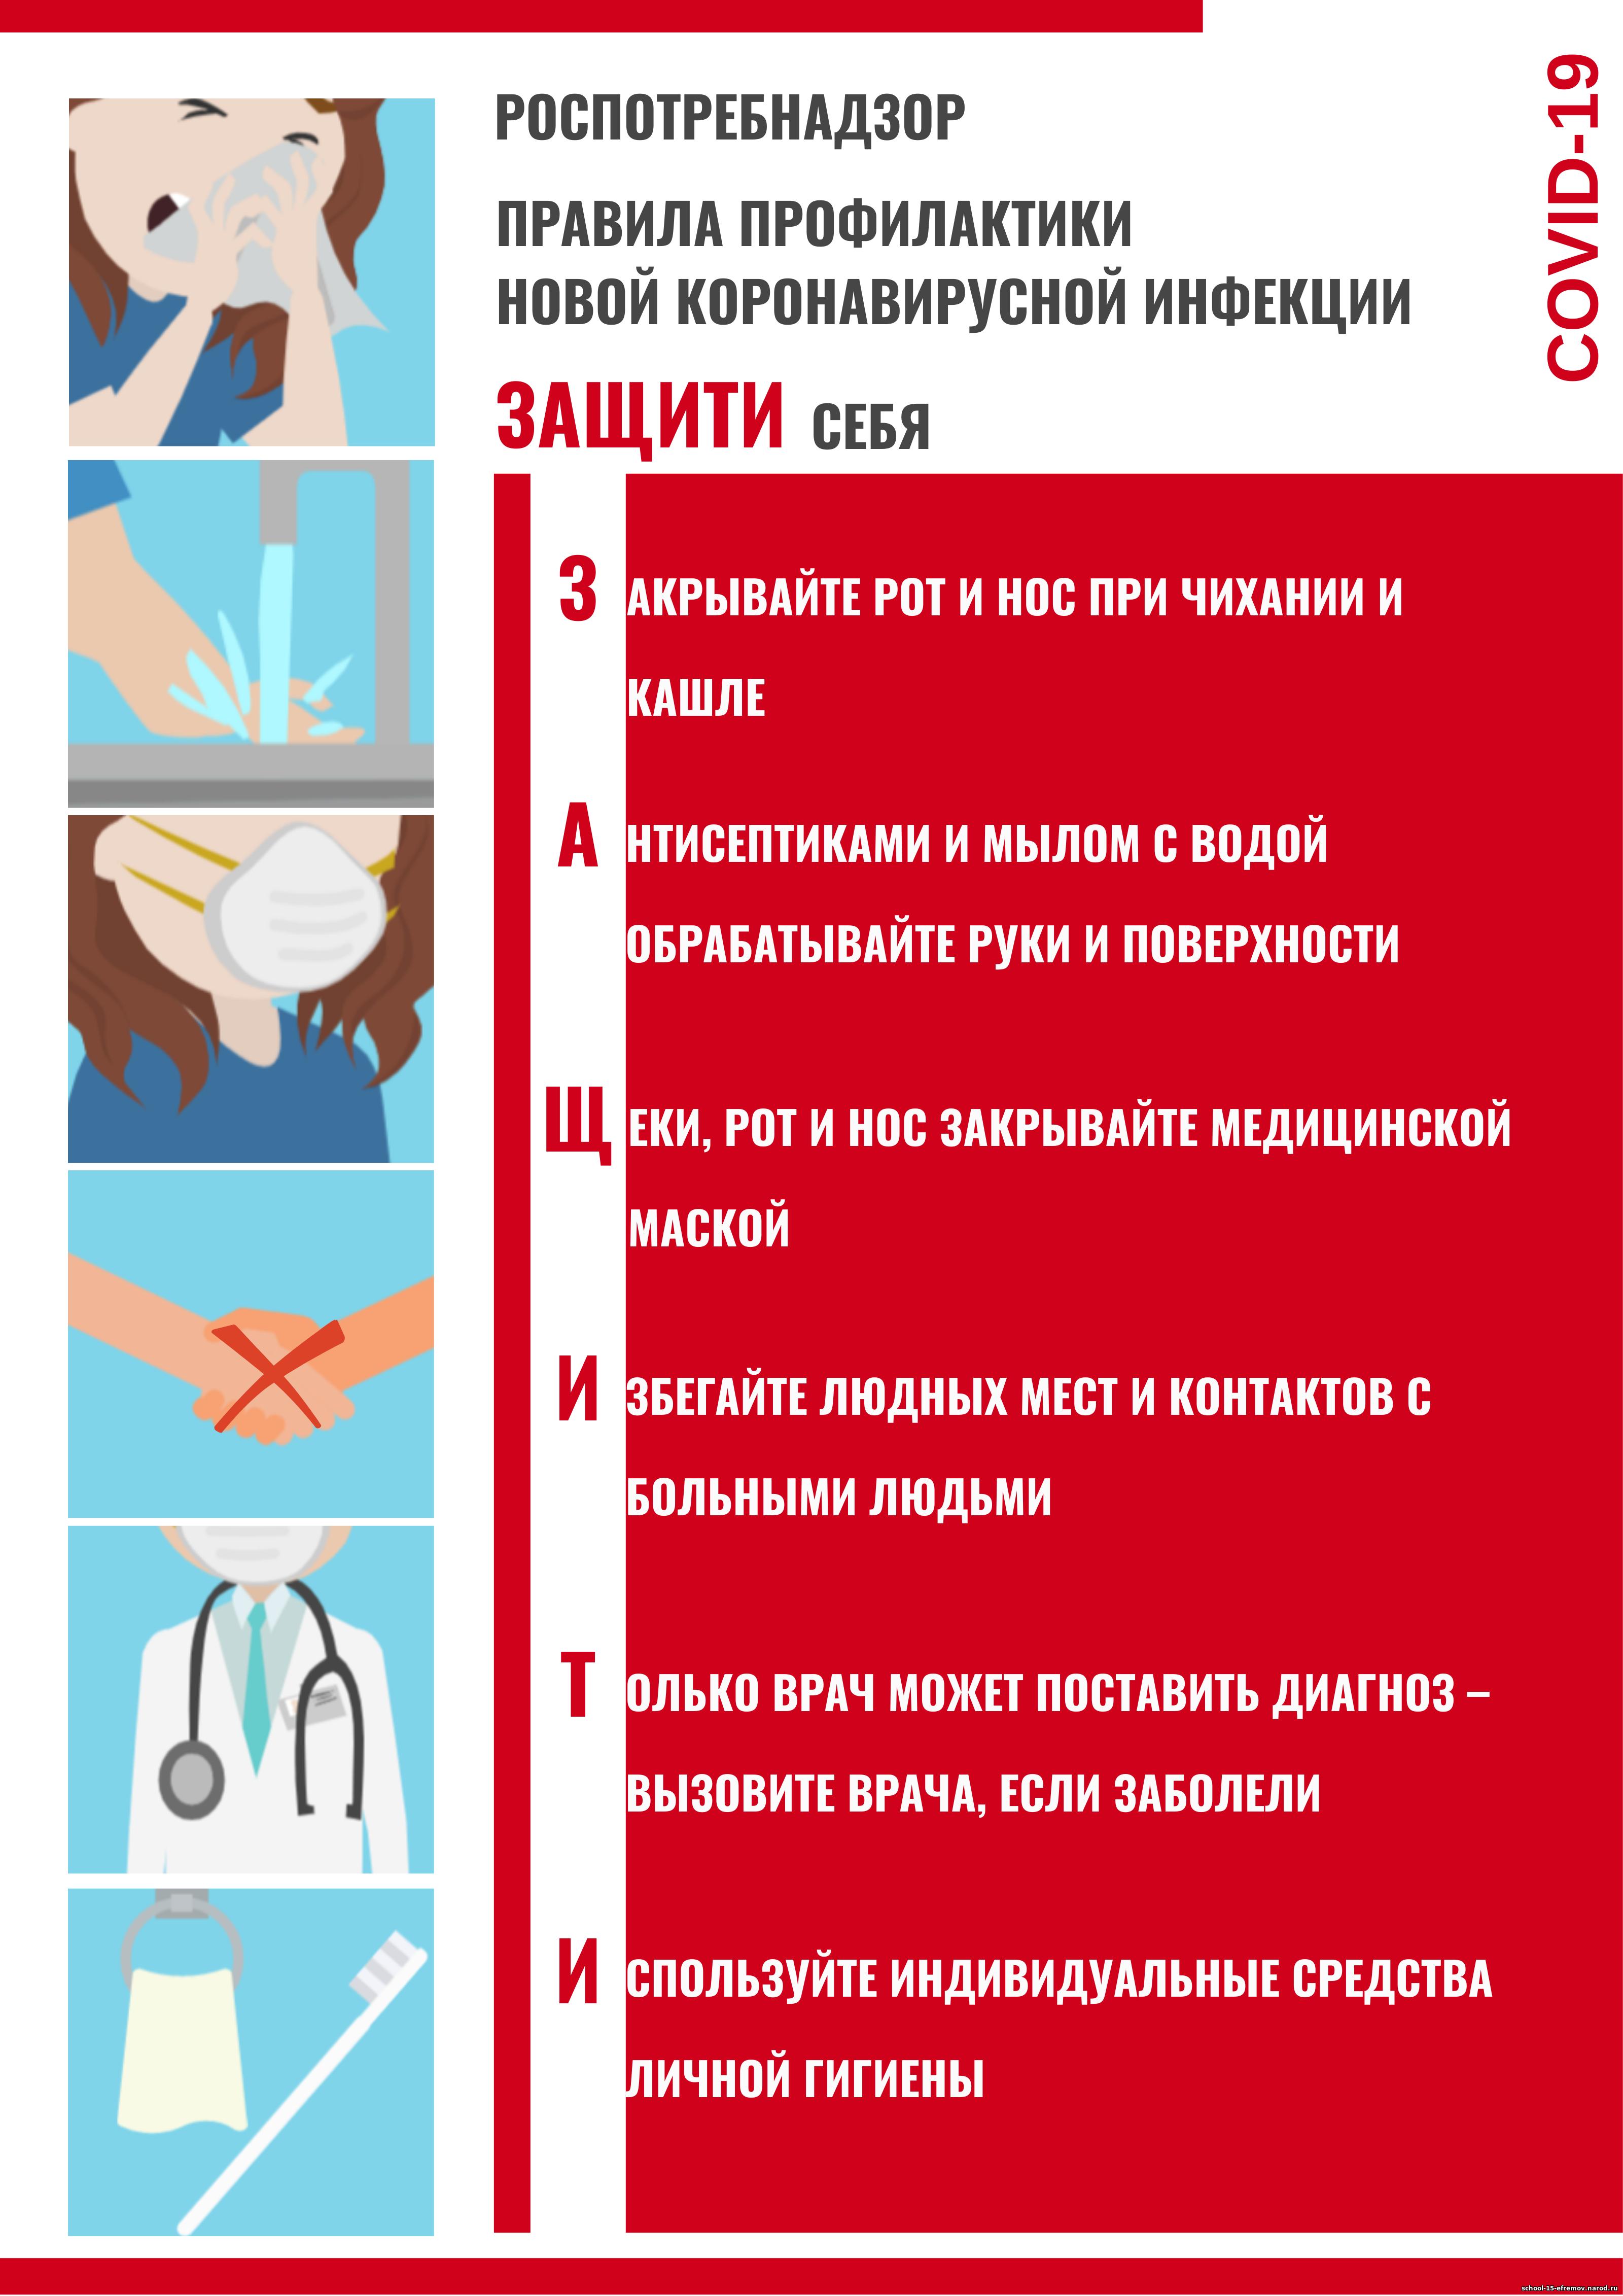 http://school-15-efremov.narod.ru/2019/pic/plakat_vert.png